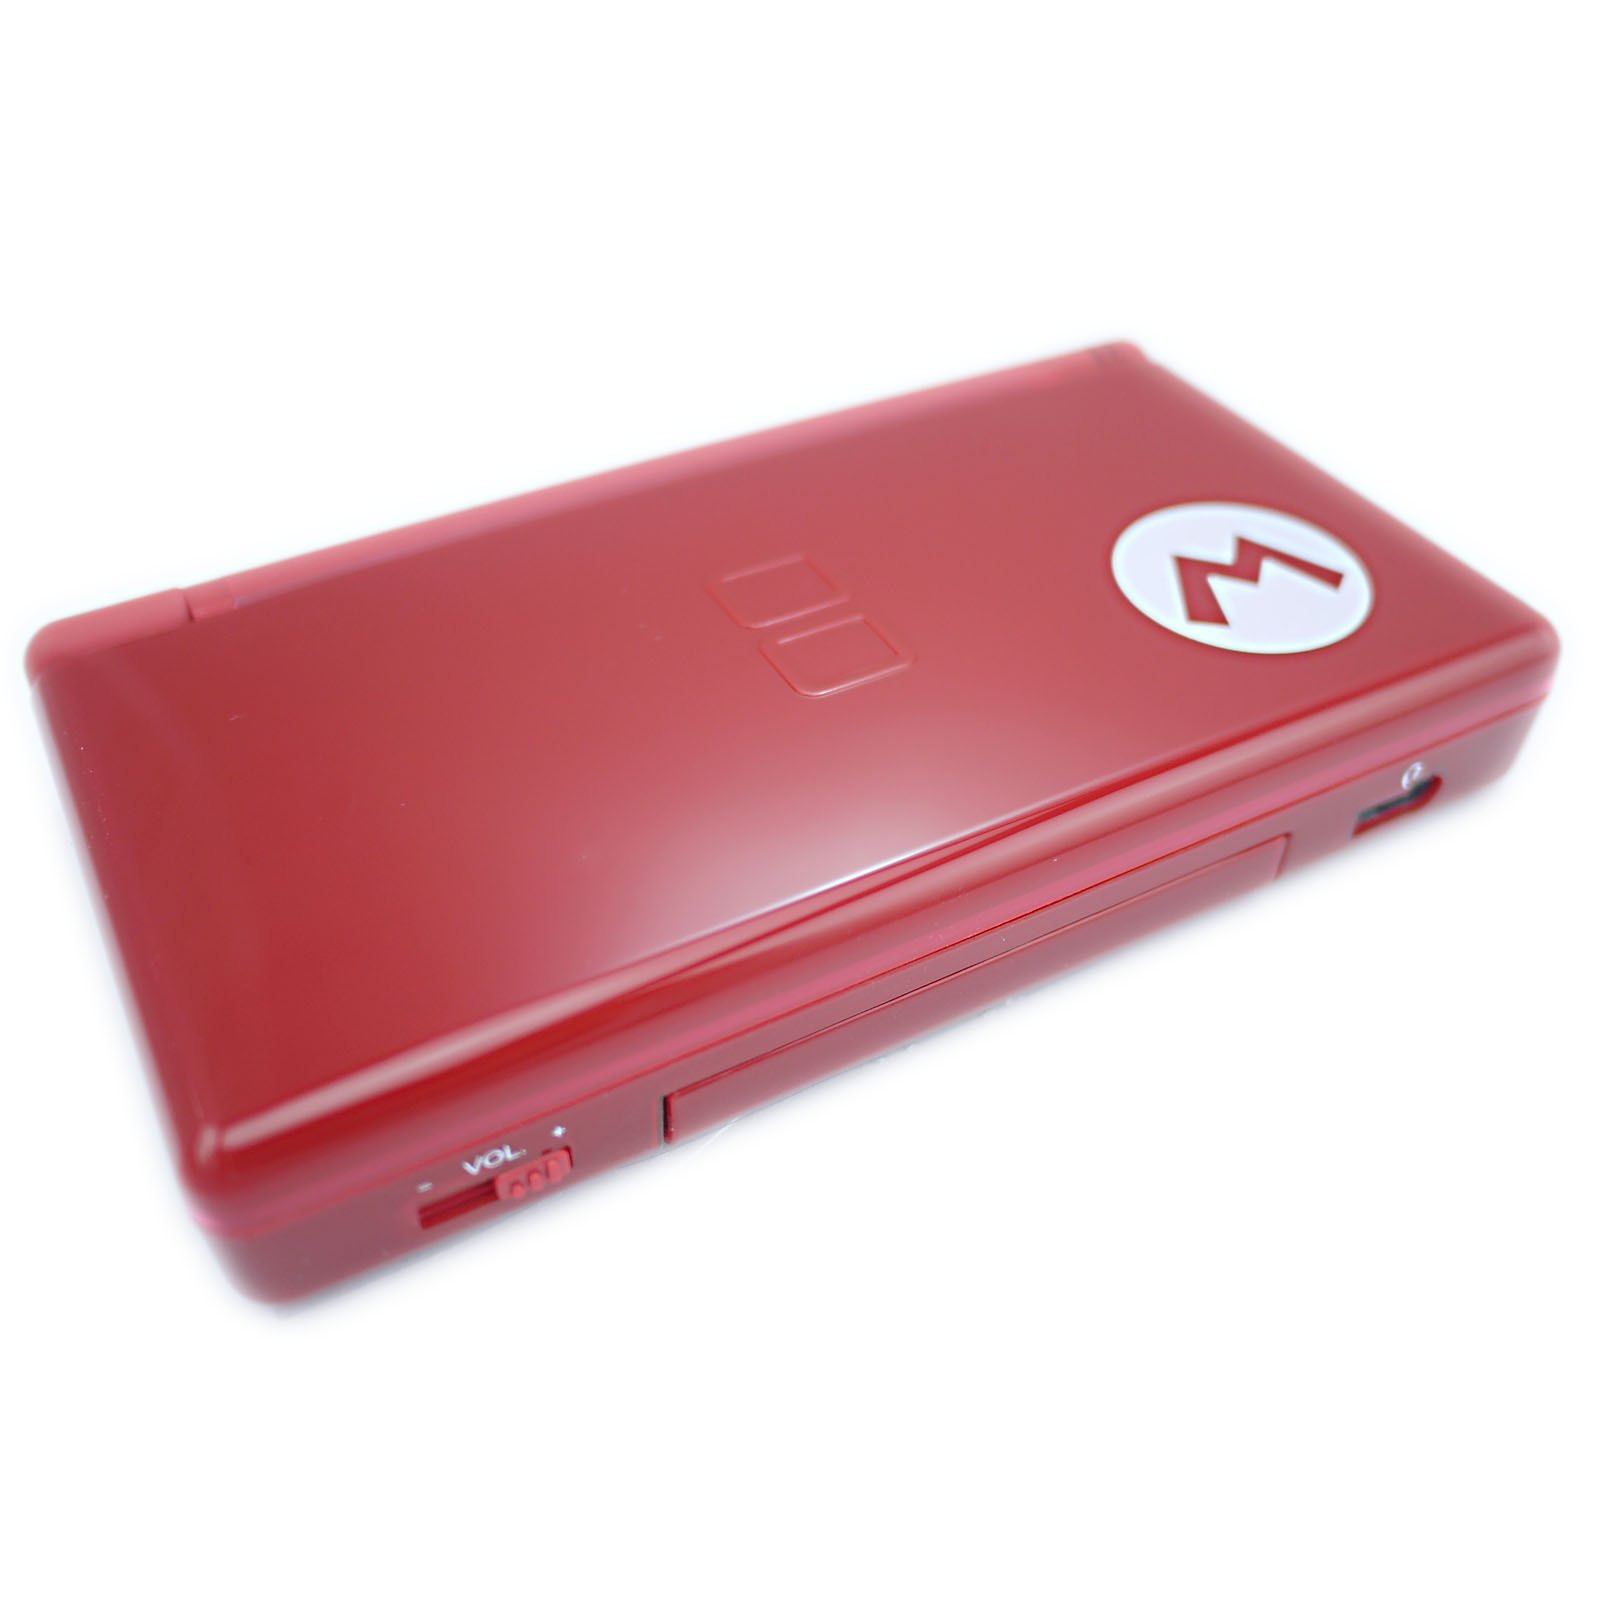 Nintendo DS Lite Console Handheld System Mario Red / Refurbished